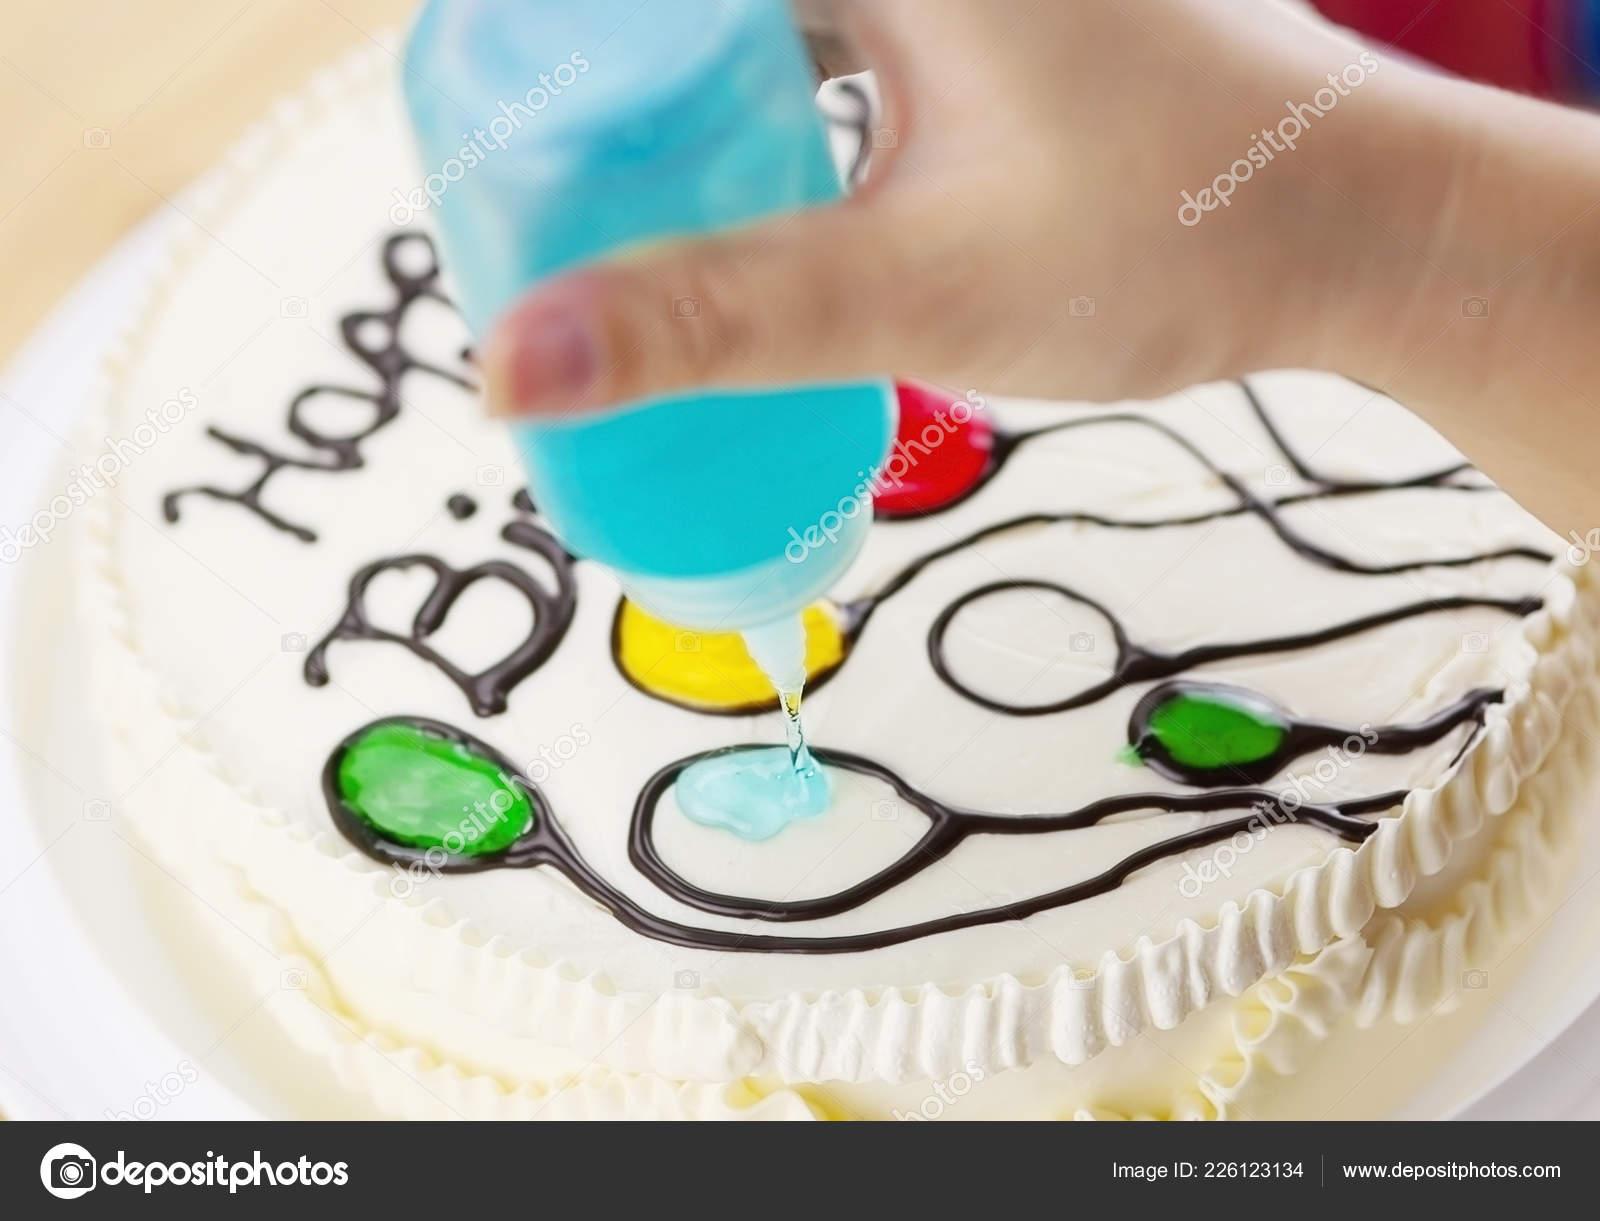 Pleasant Birthday Cake Decoration Using Green Yam Making Colorful Balloon Birthday Cards Printable Benkemecafe Filternl